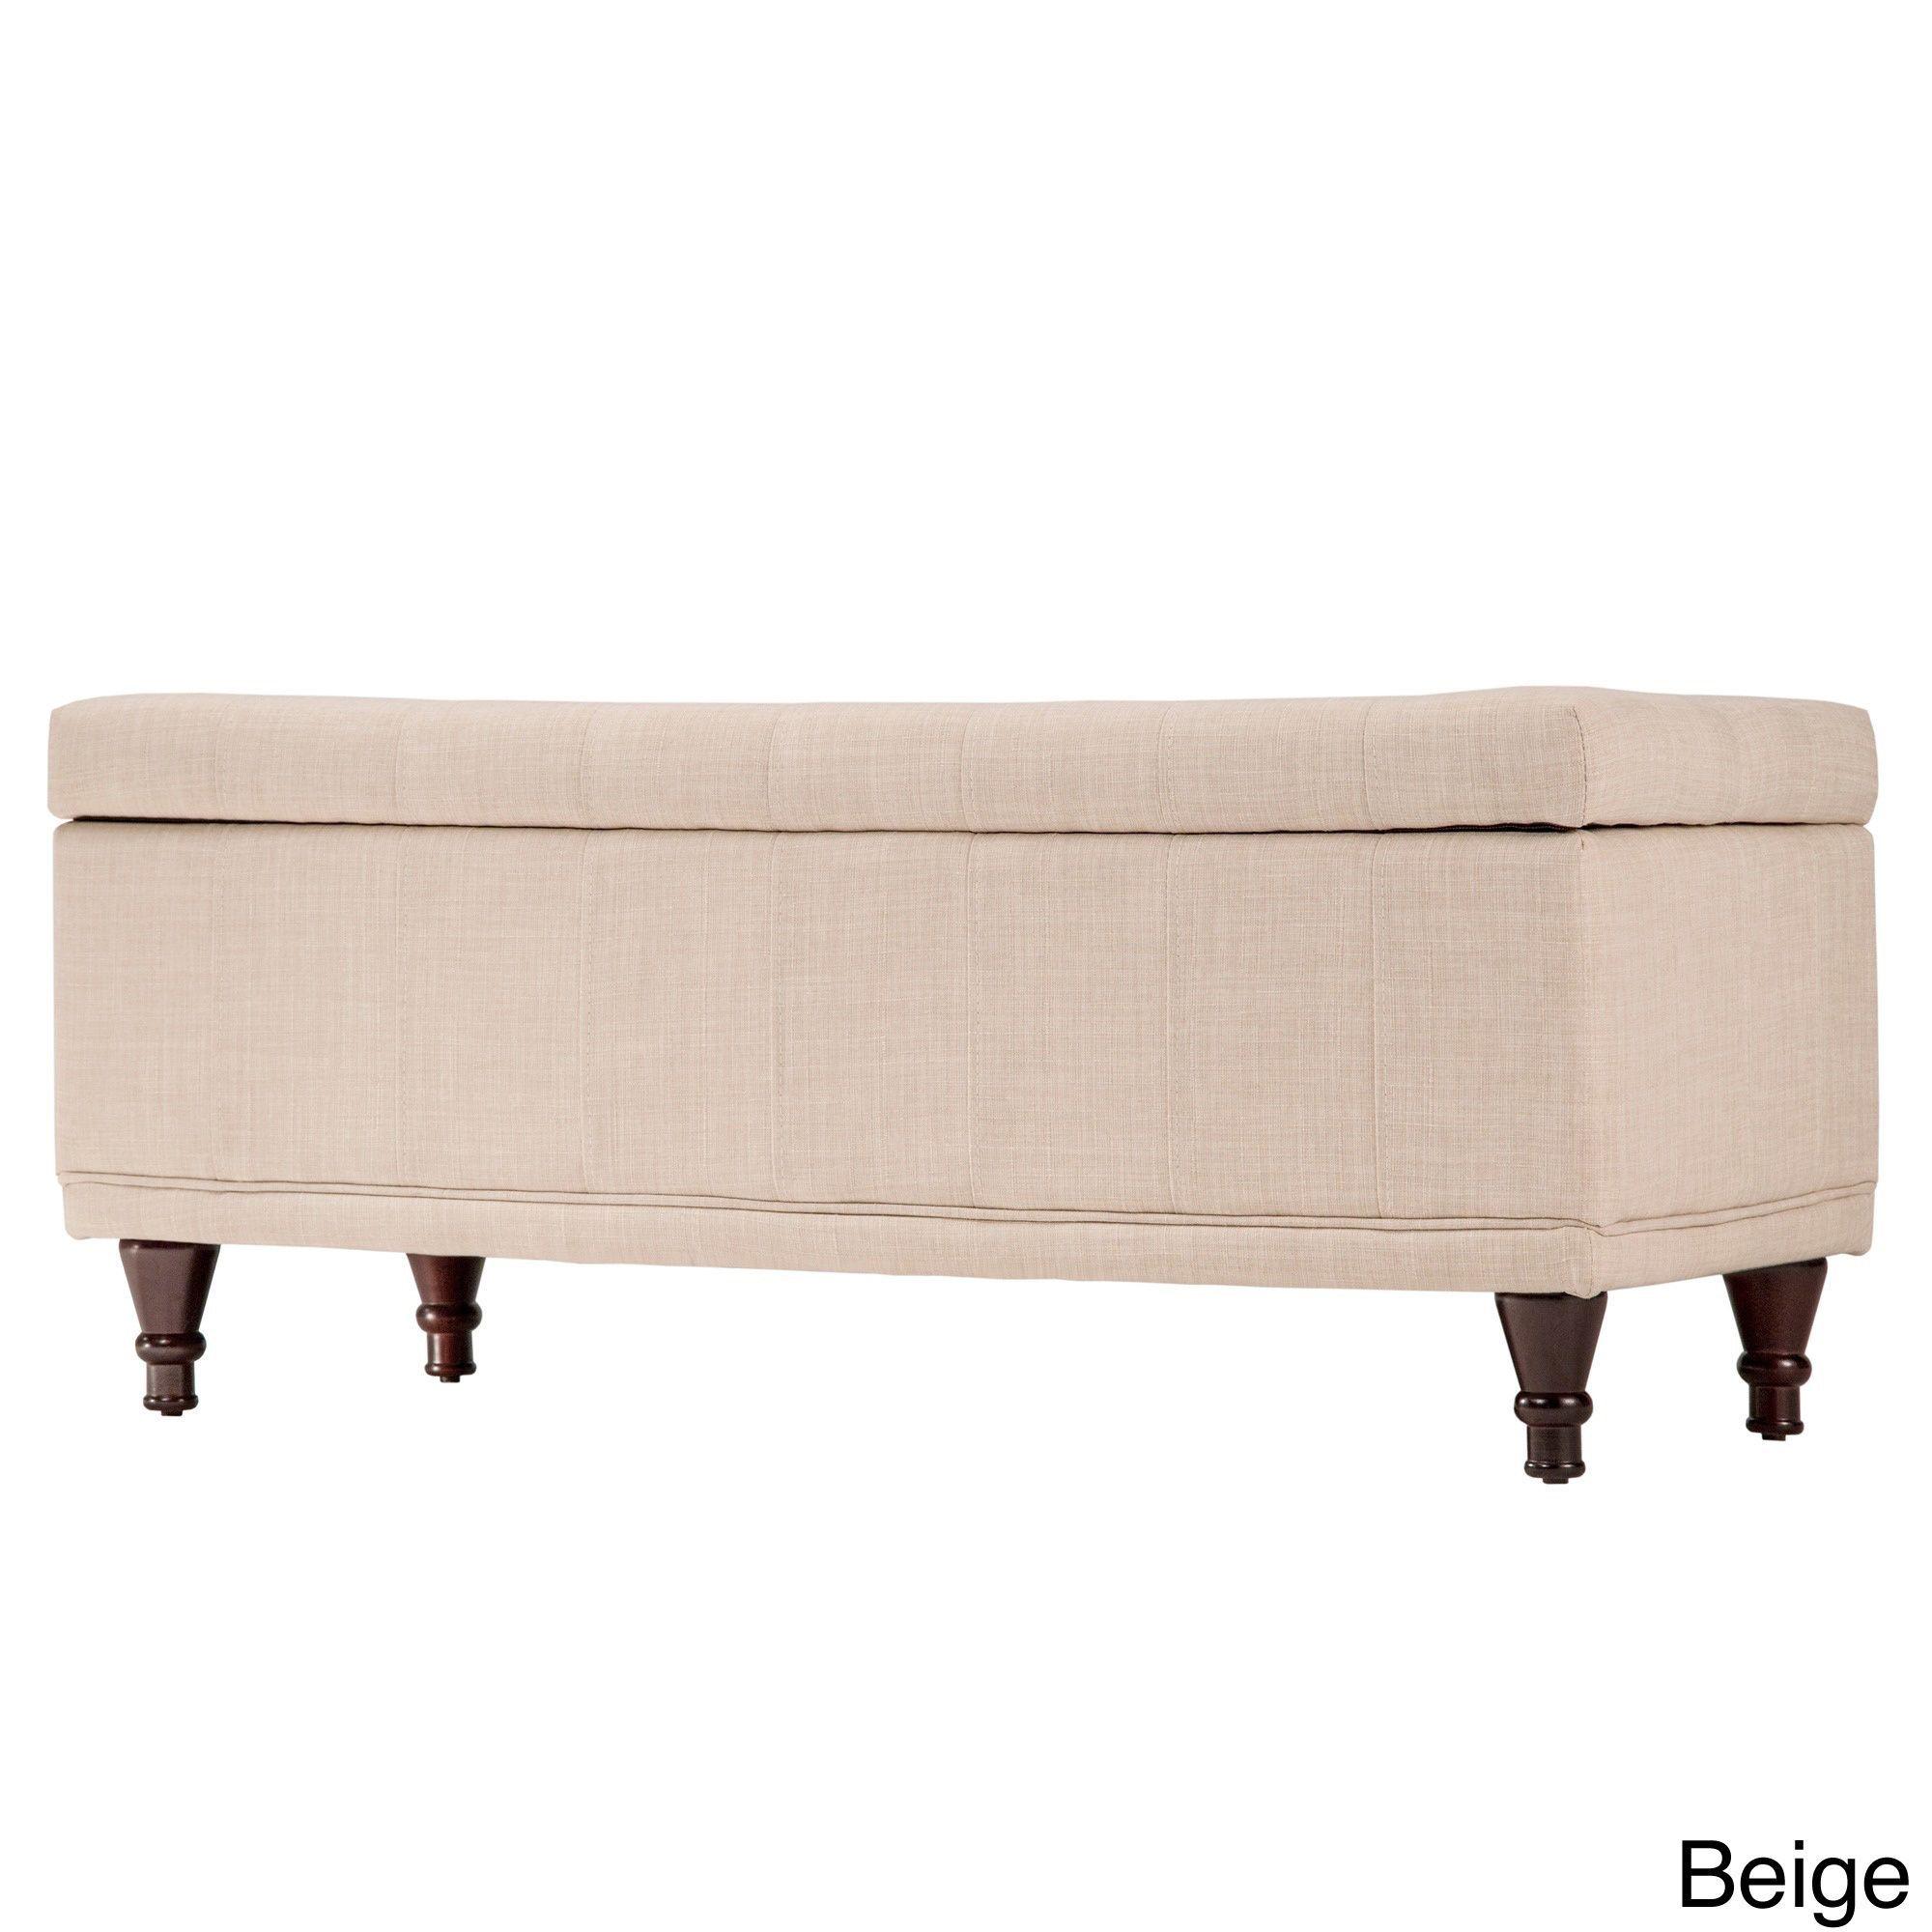 Inspire Q St Ives Lift Top Tufted Storage Bench (Beige Linen), Brown (